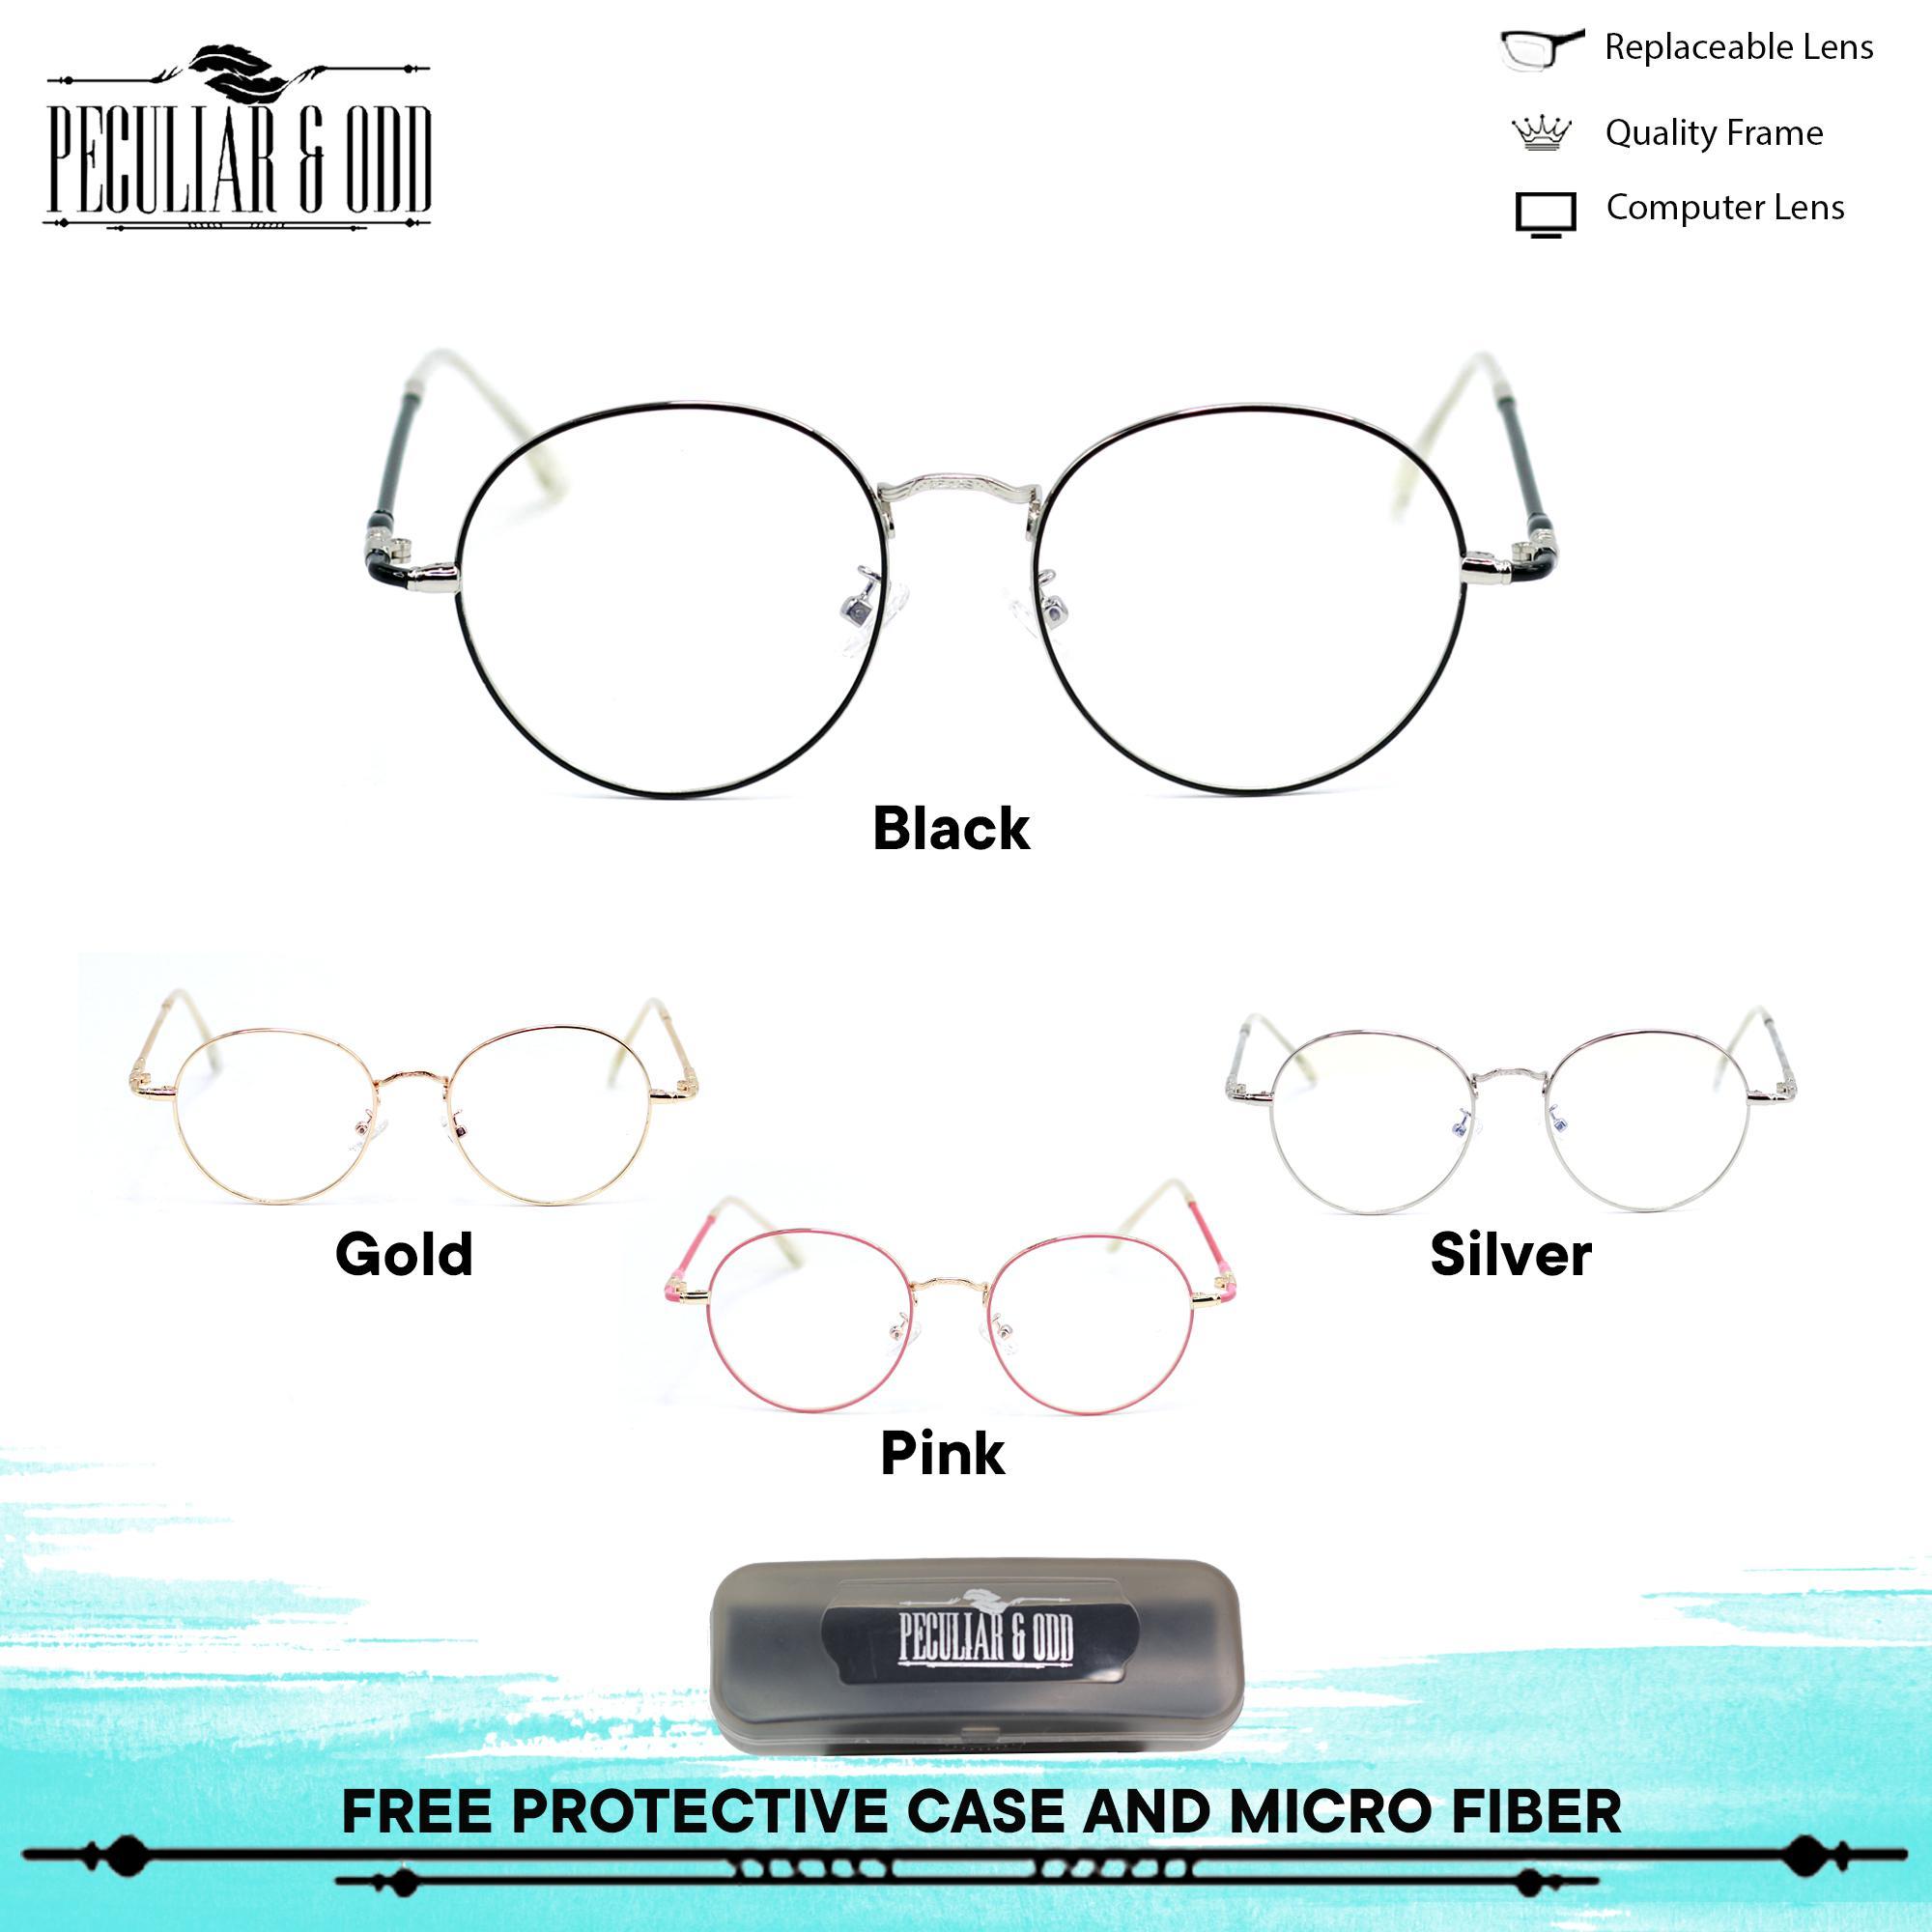 96b15338be3c Peculiar Round Eyeglasses 9007 Antiradiation Lenses in Thin Metal Frame  Lightweight Replaceable Optical Lens Unisex Eyewear